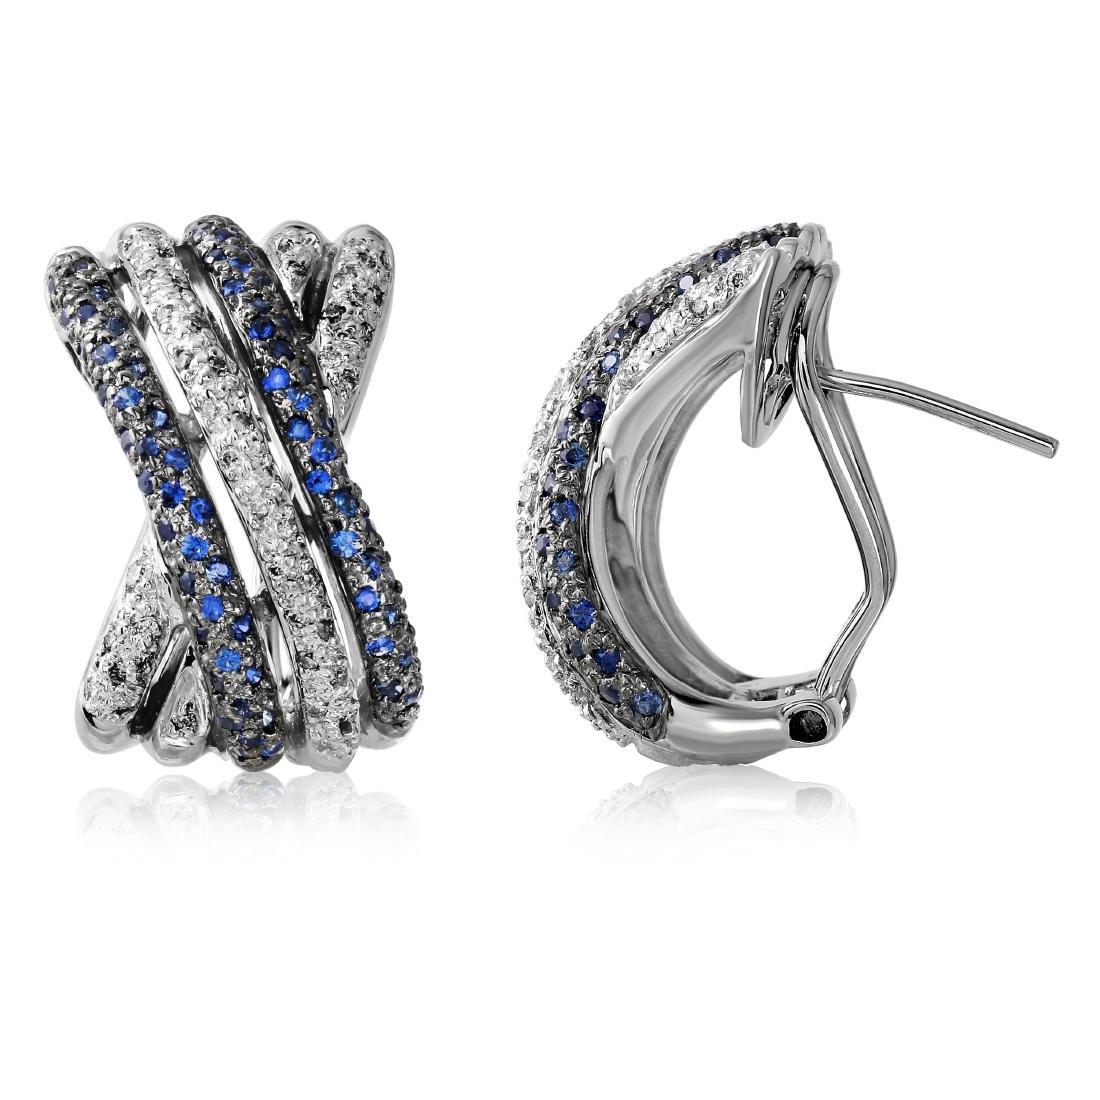 1.04 CTW Sapphire Huggy  Earring in 14K White Gold